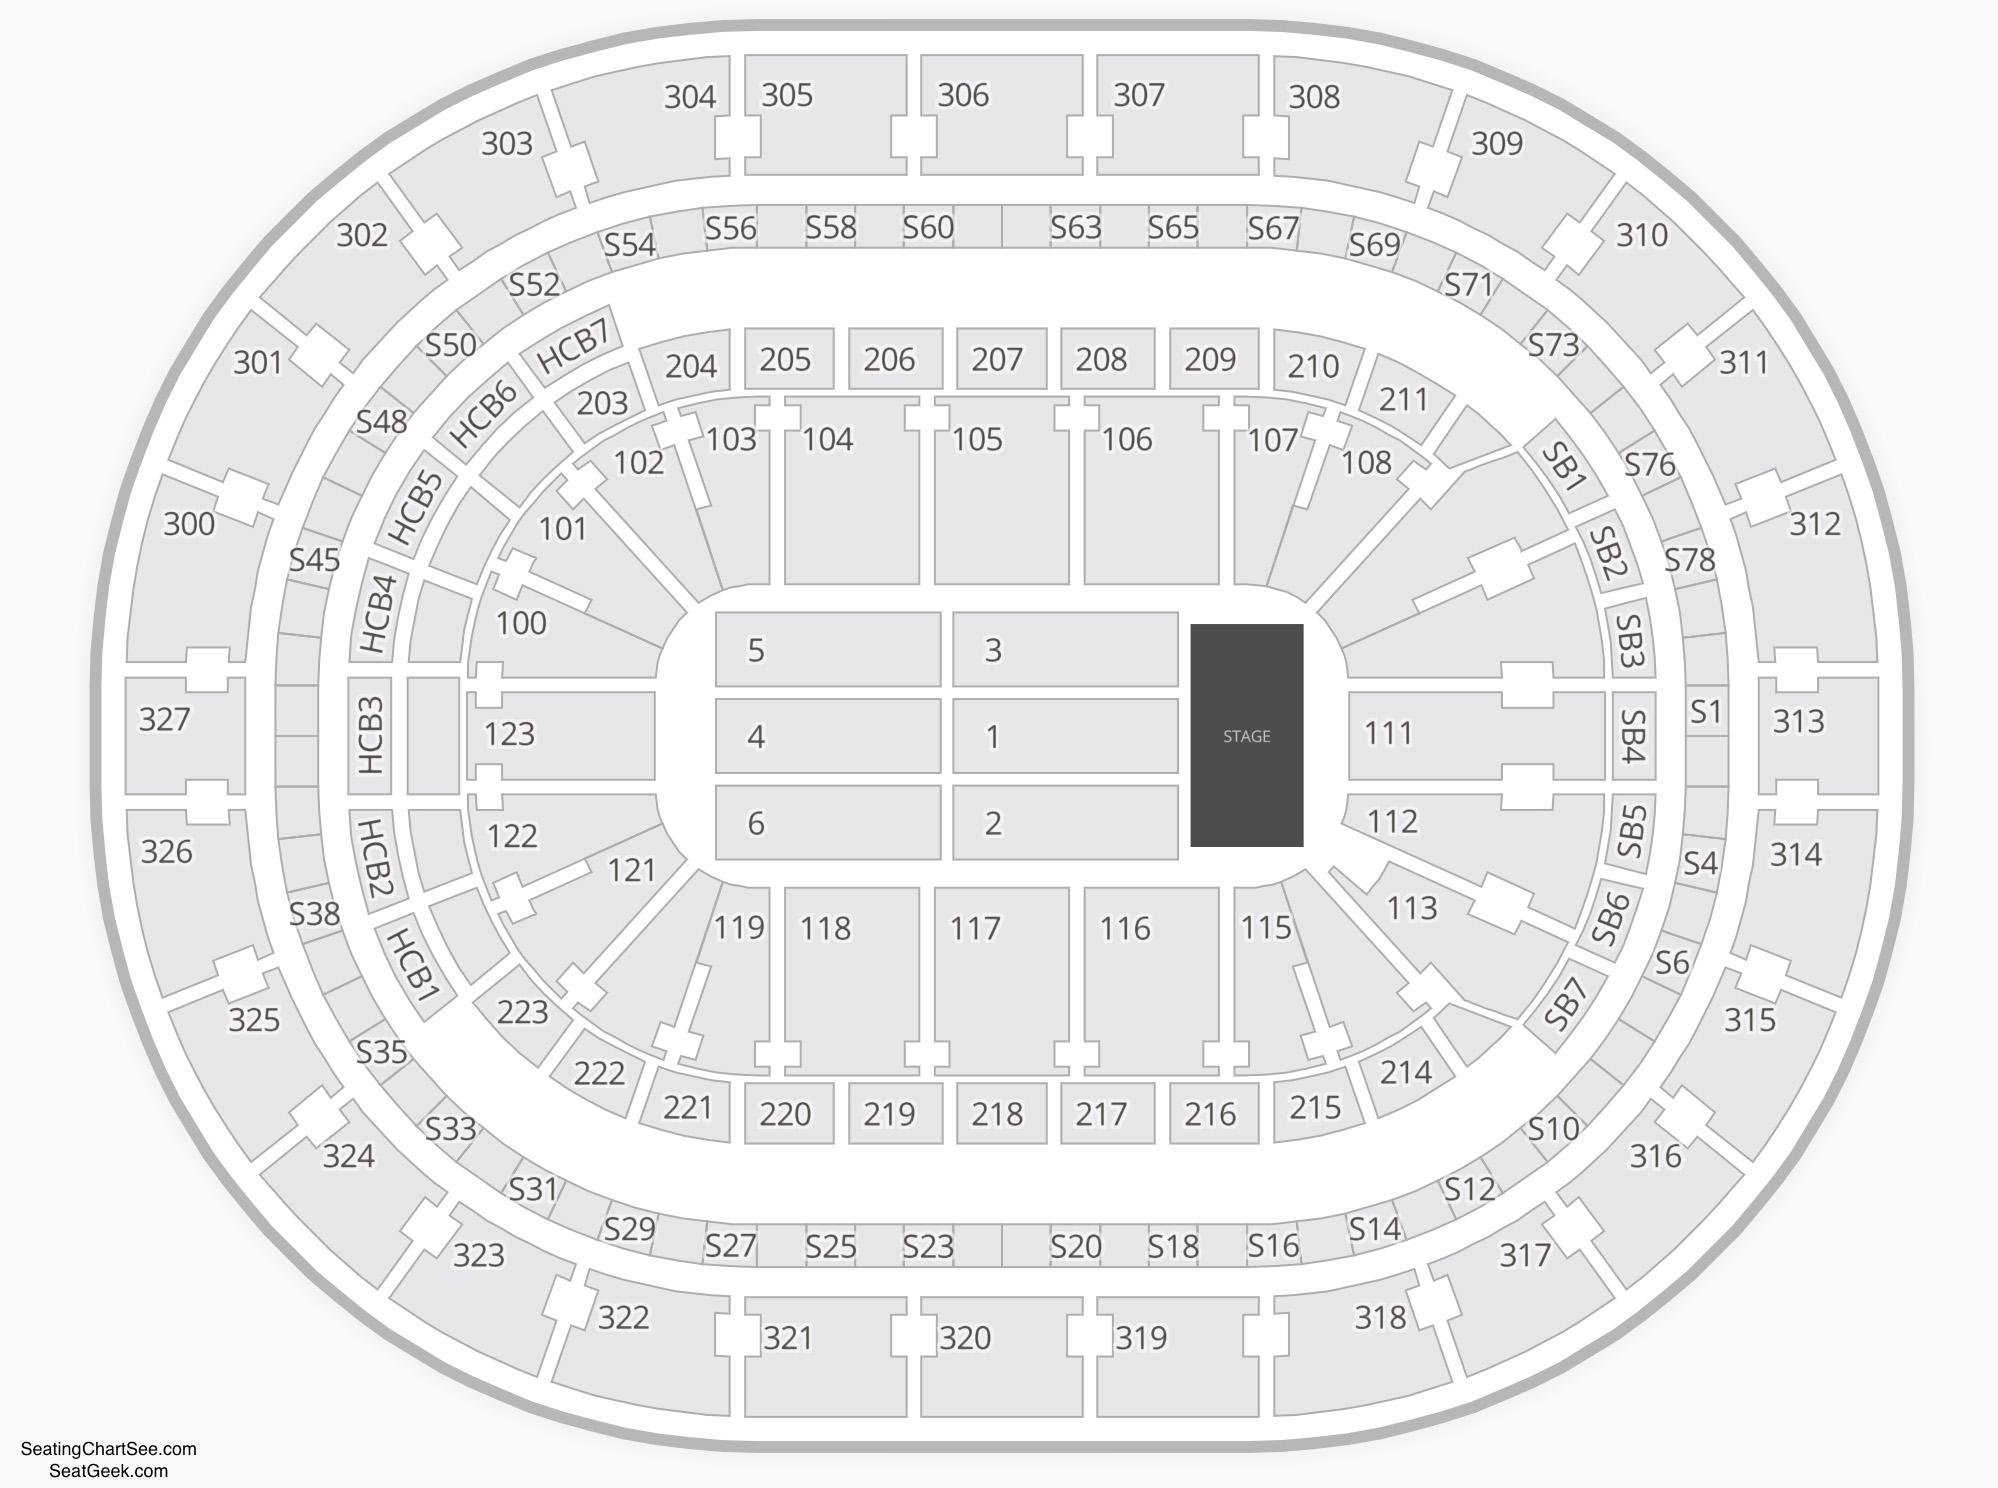 KeyBank Center Seating Chart